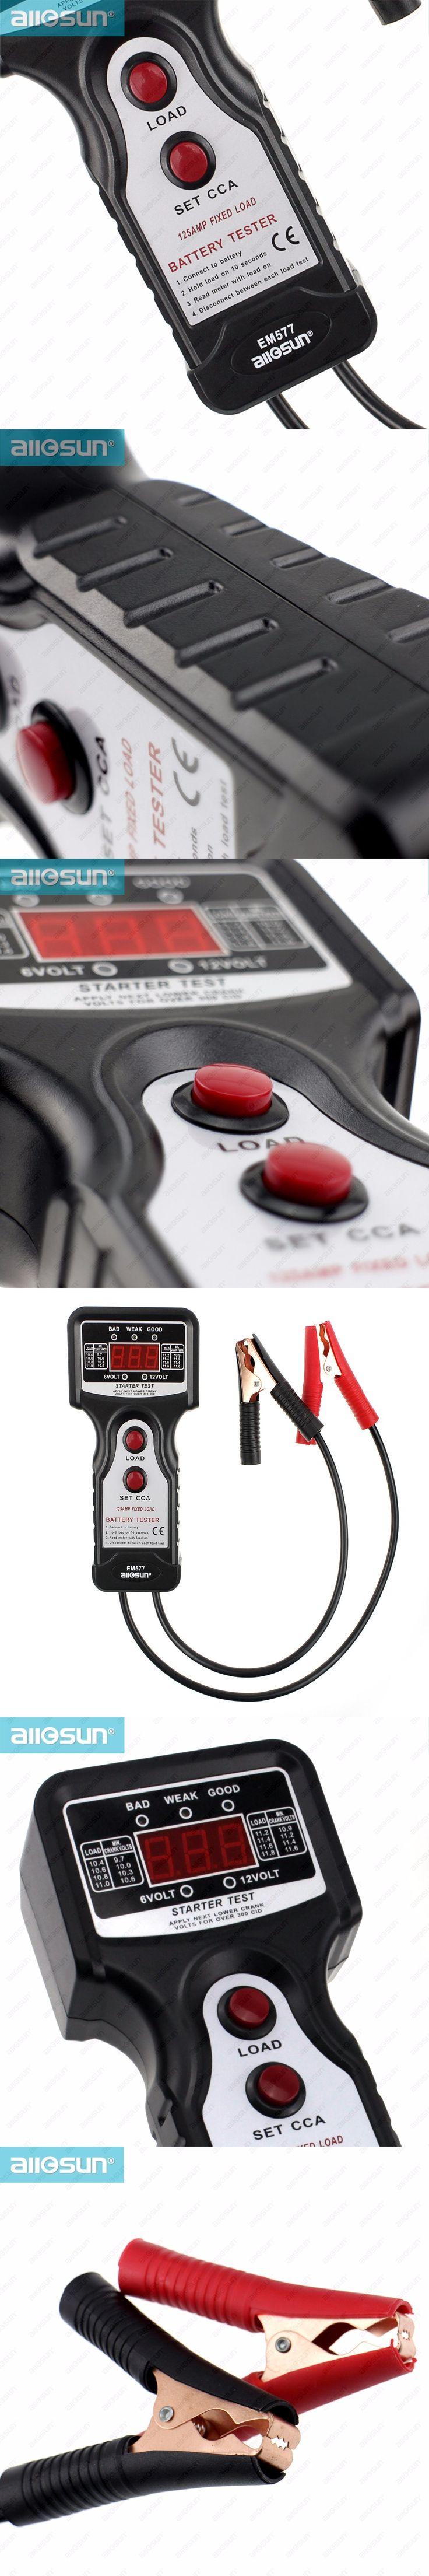 Digital Automotive Battery Tester Analyzer Battery Diagnostic Tools starter motor load voltage test Professional All-Sun EM577